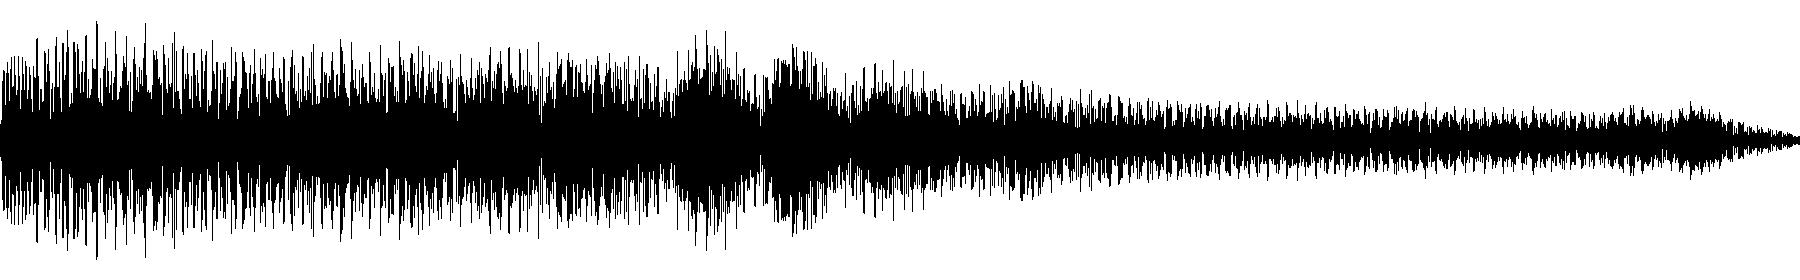 vinyl rhodes